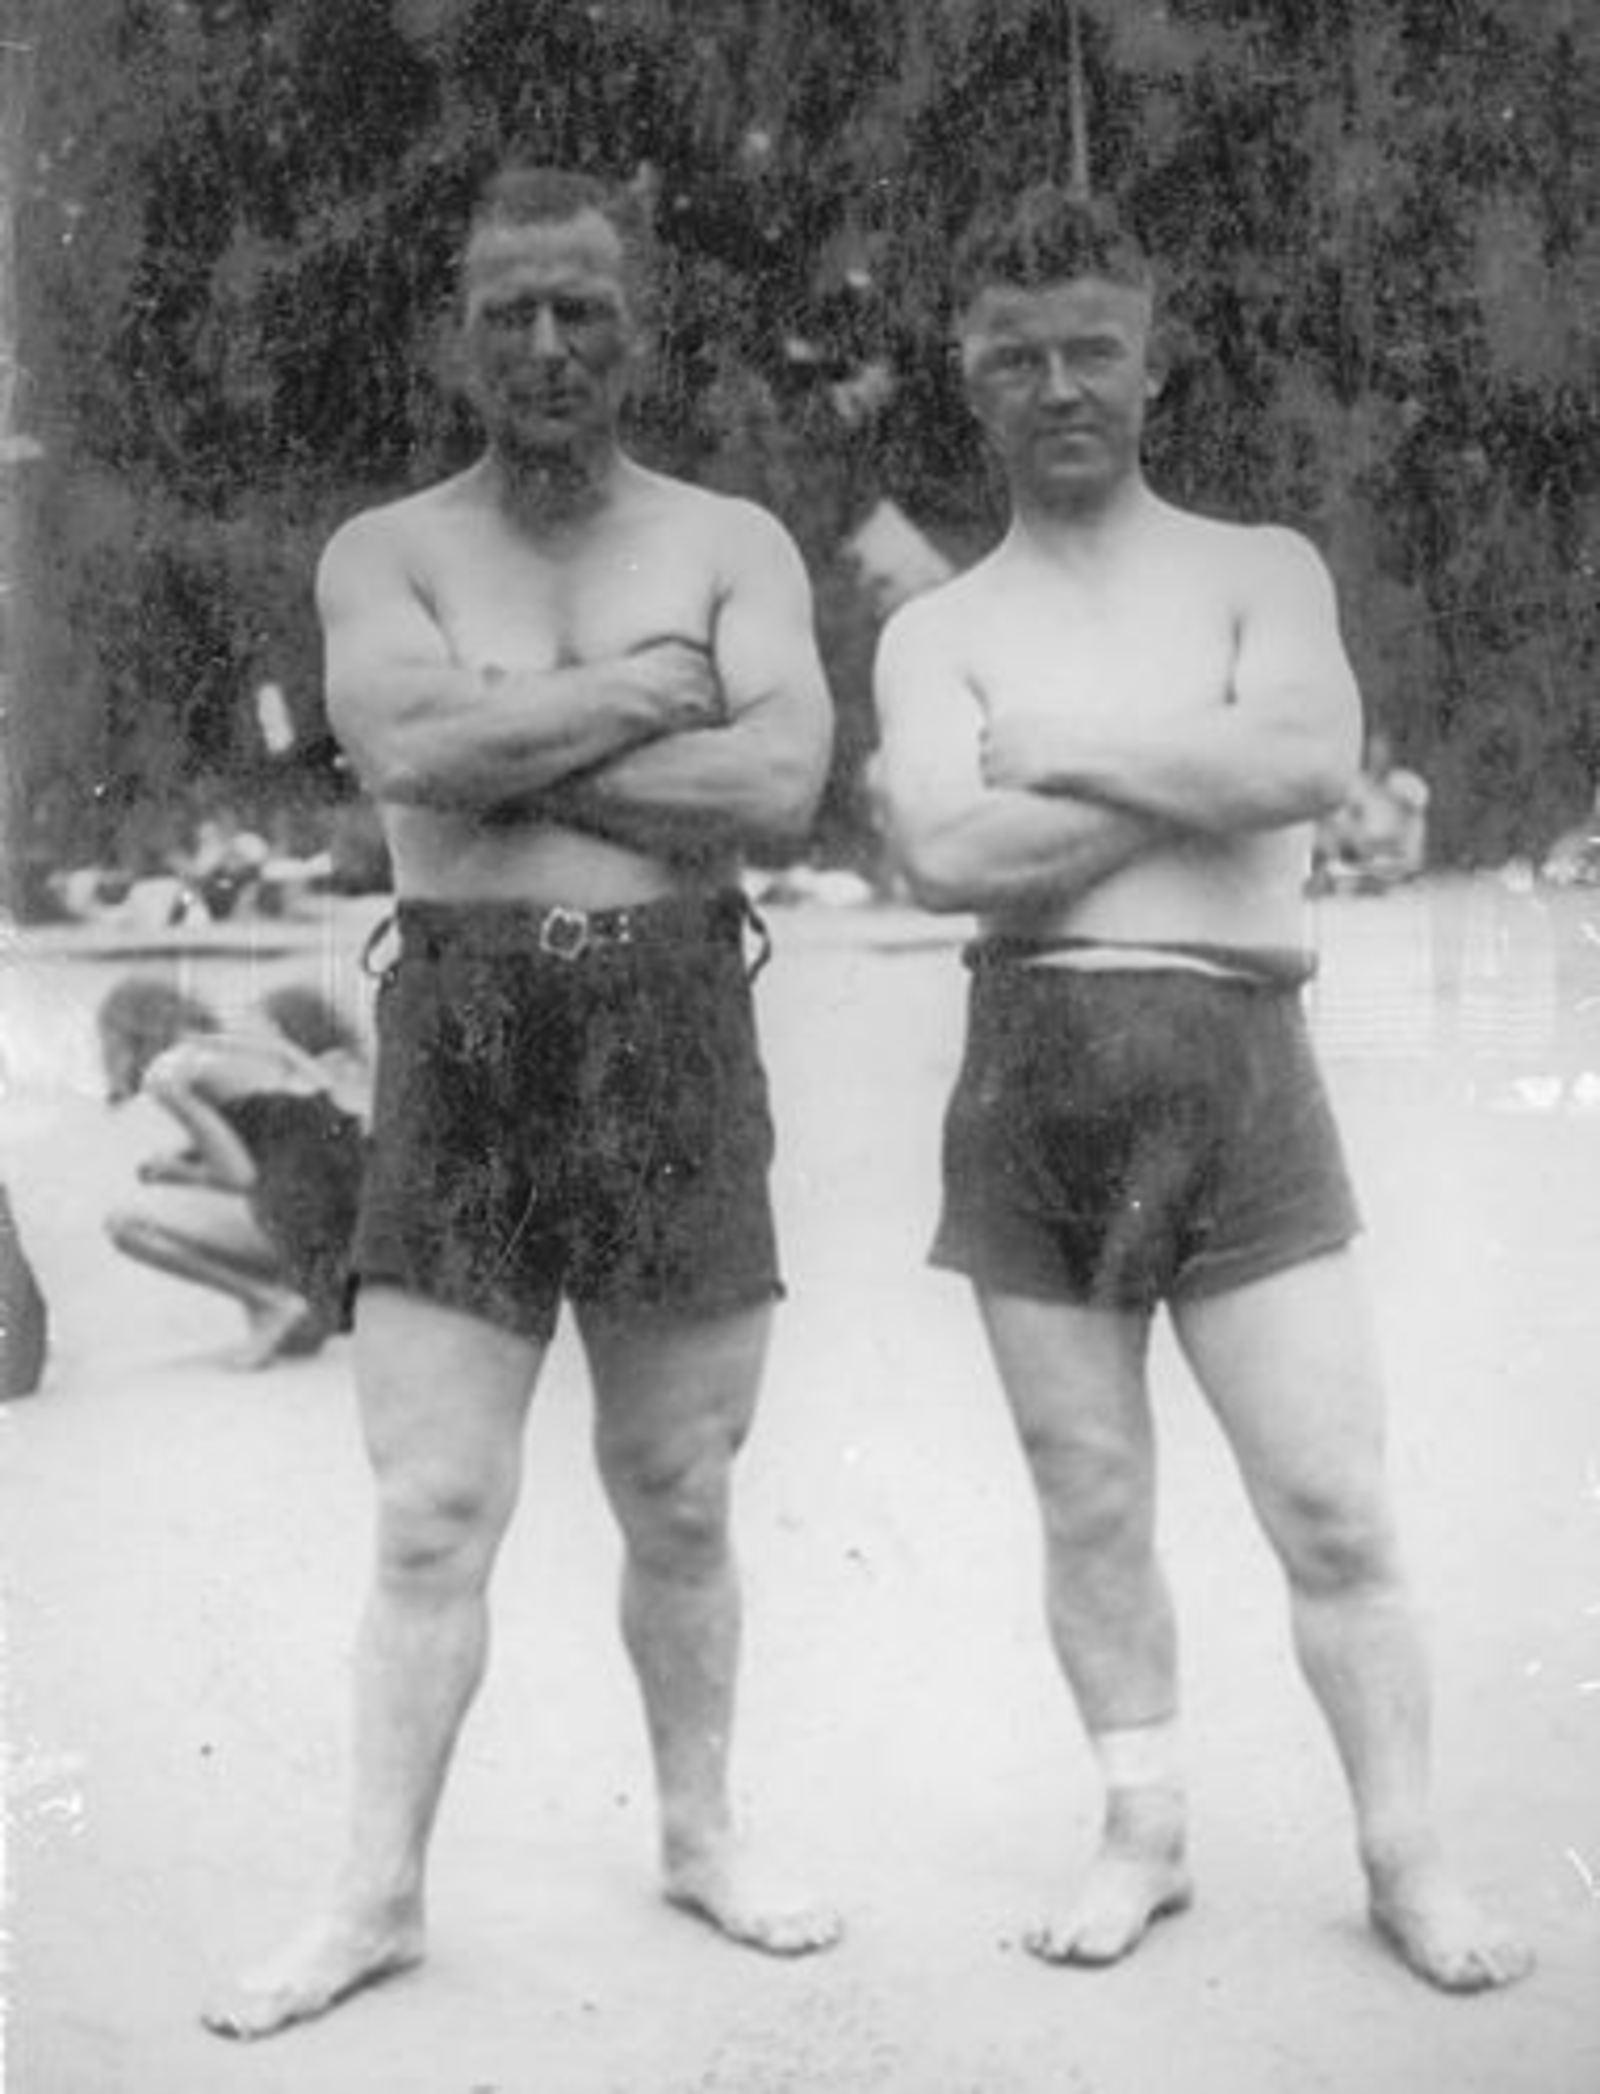 Bliek Leen 1903 19__ met broer Gerrit